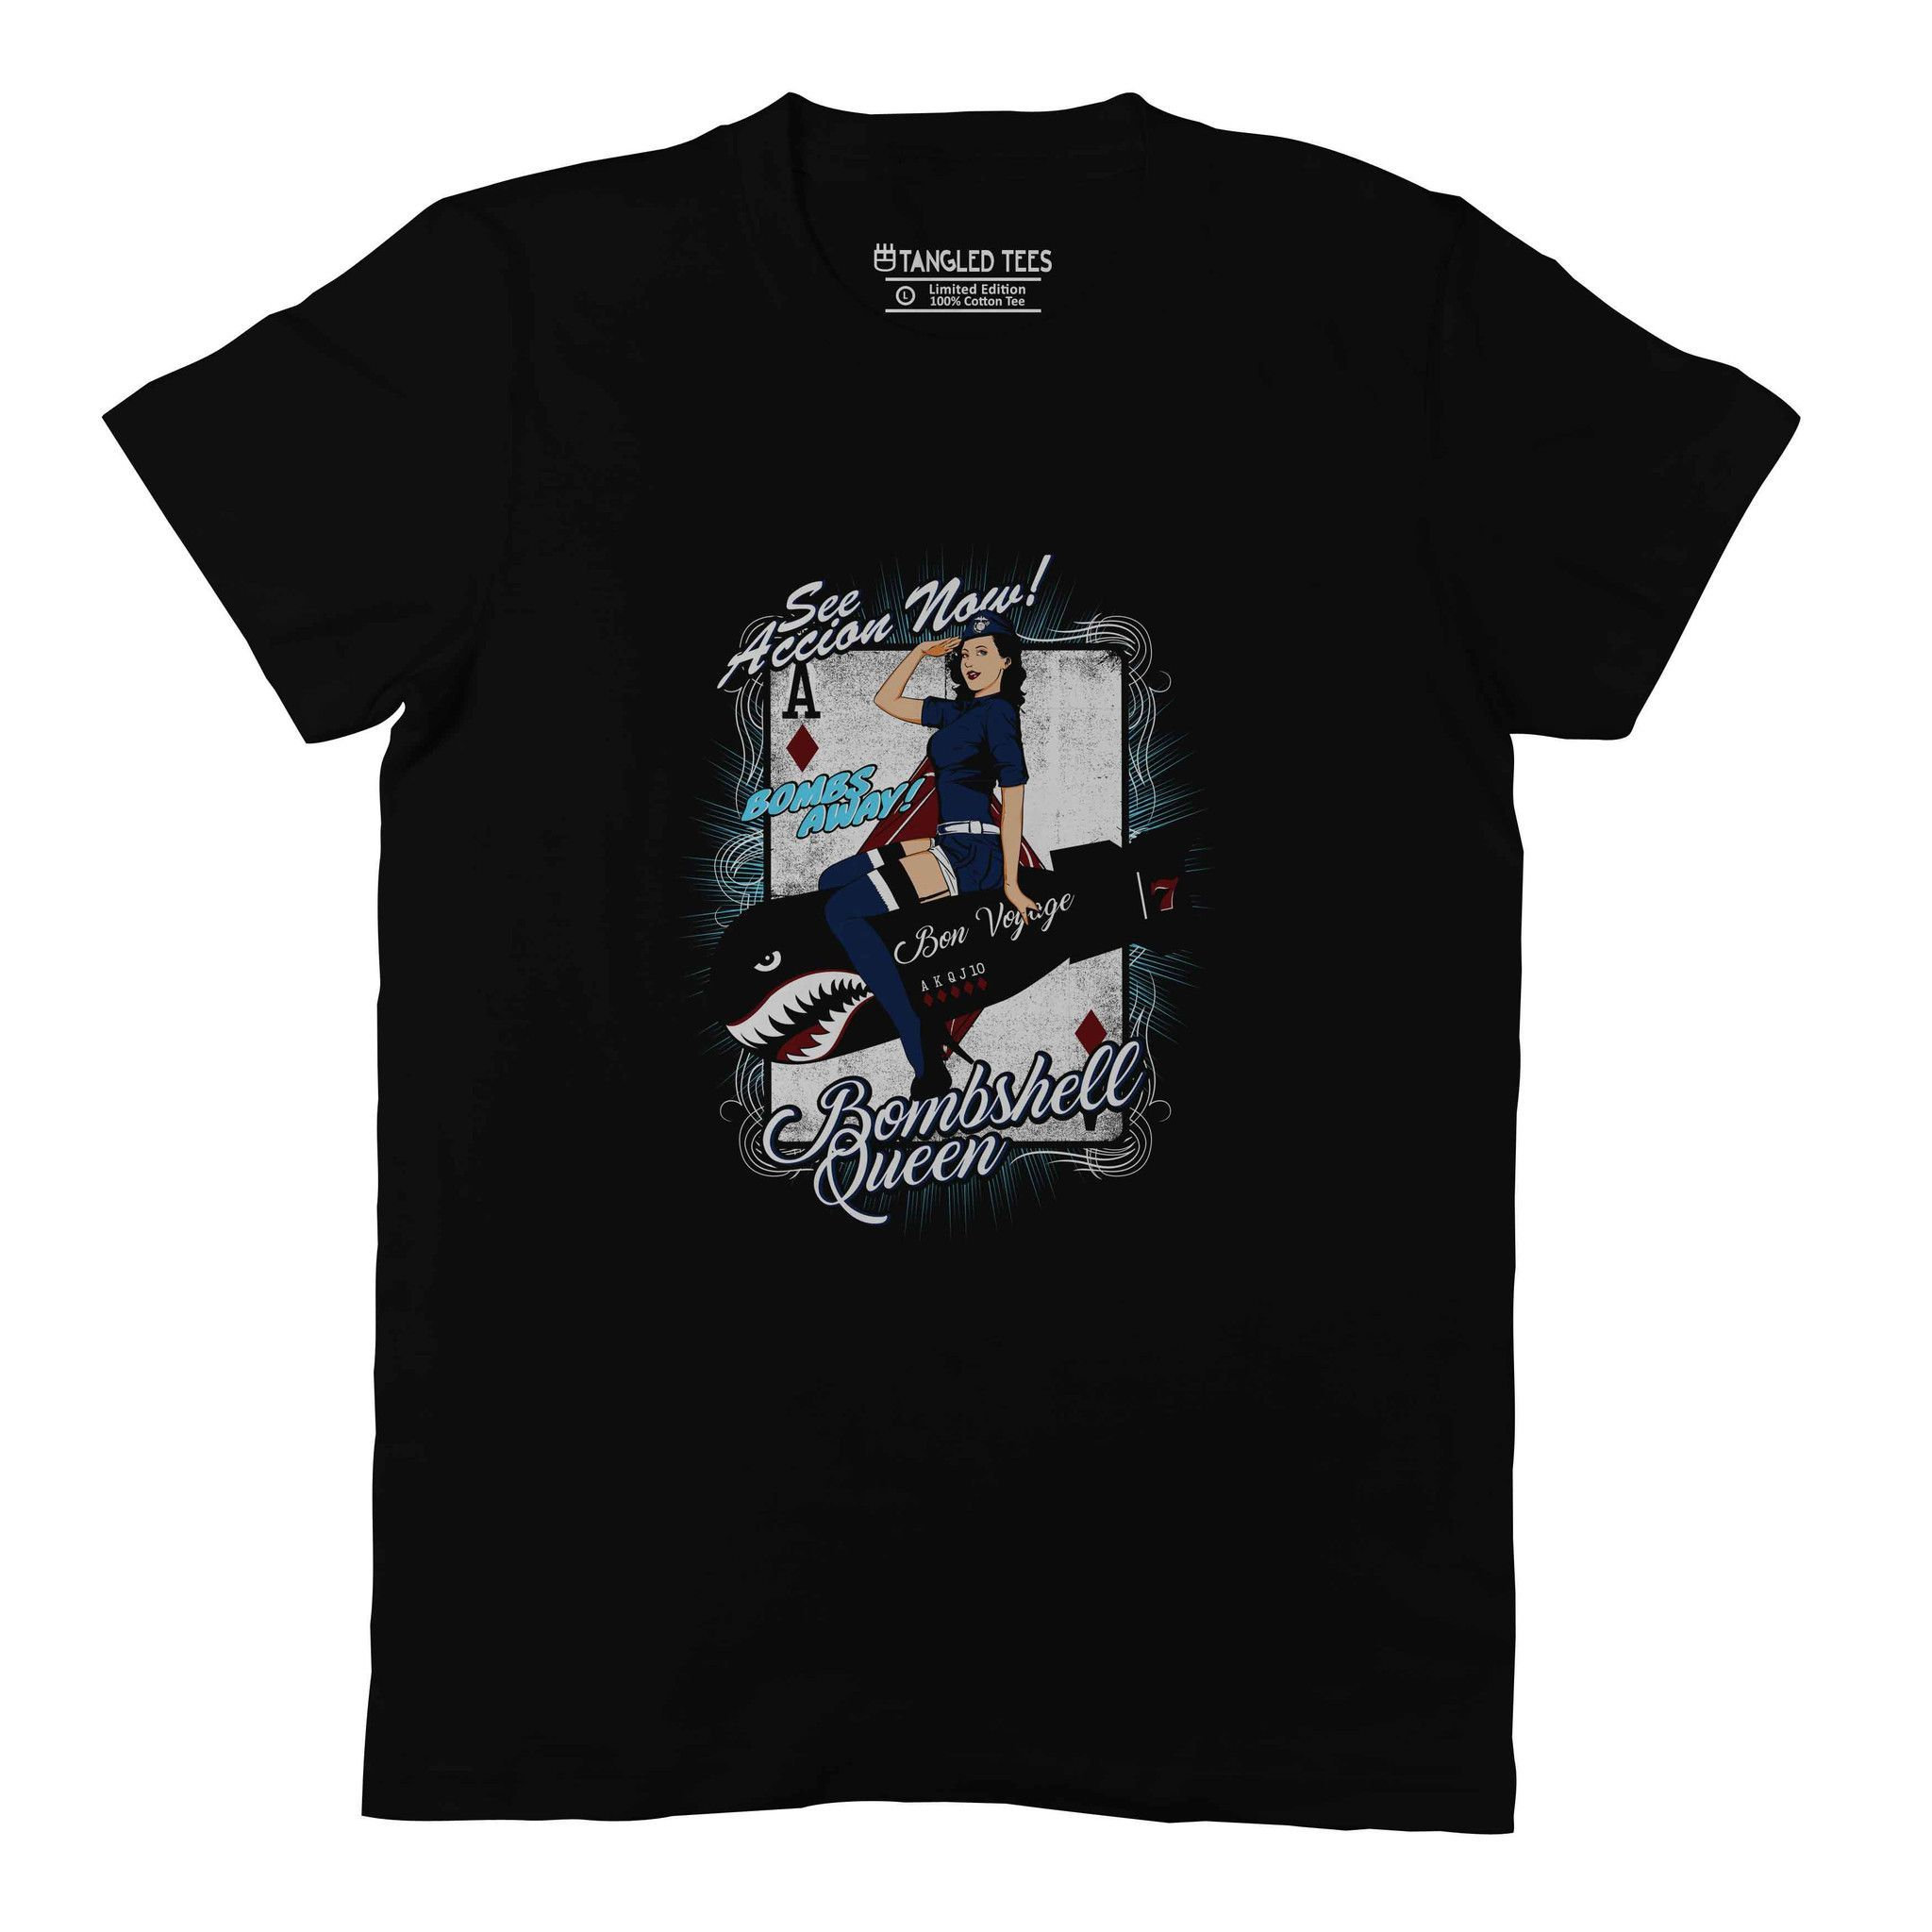 See More Action Shirts